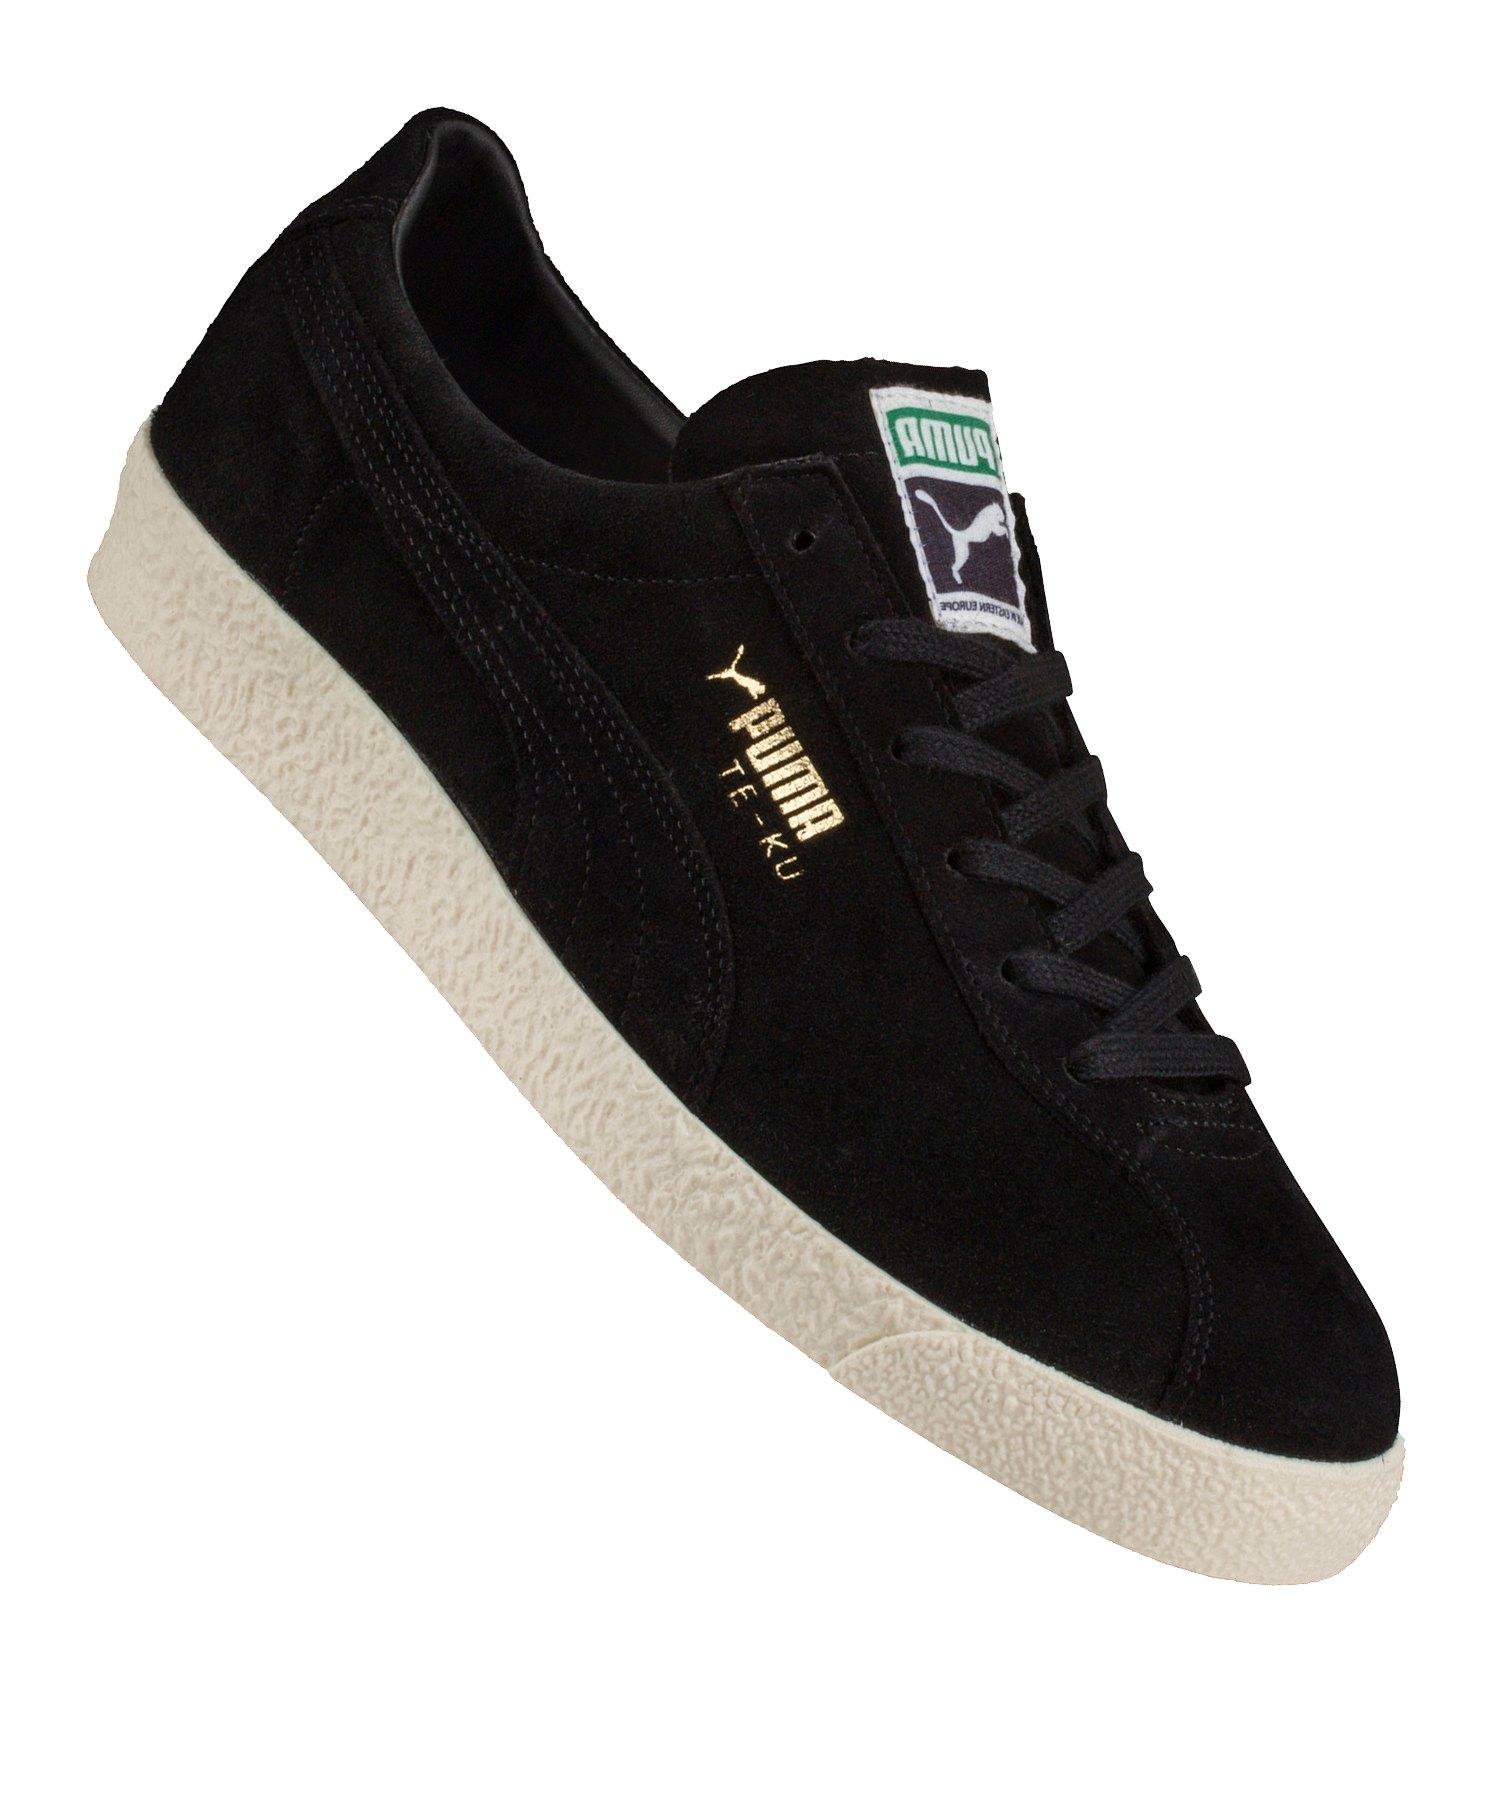 Ku Gold Sneaker Te Schwarz F04 Puma N0mnwOv8